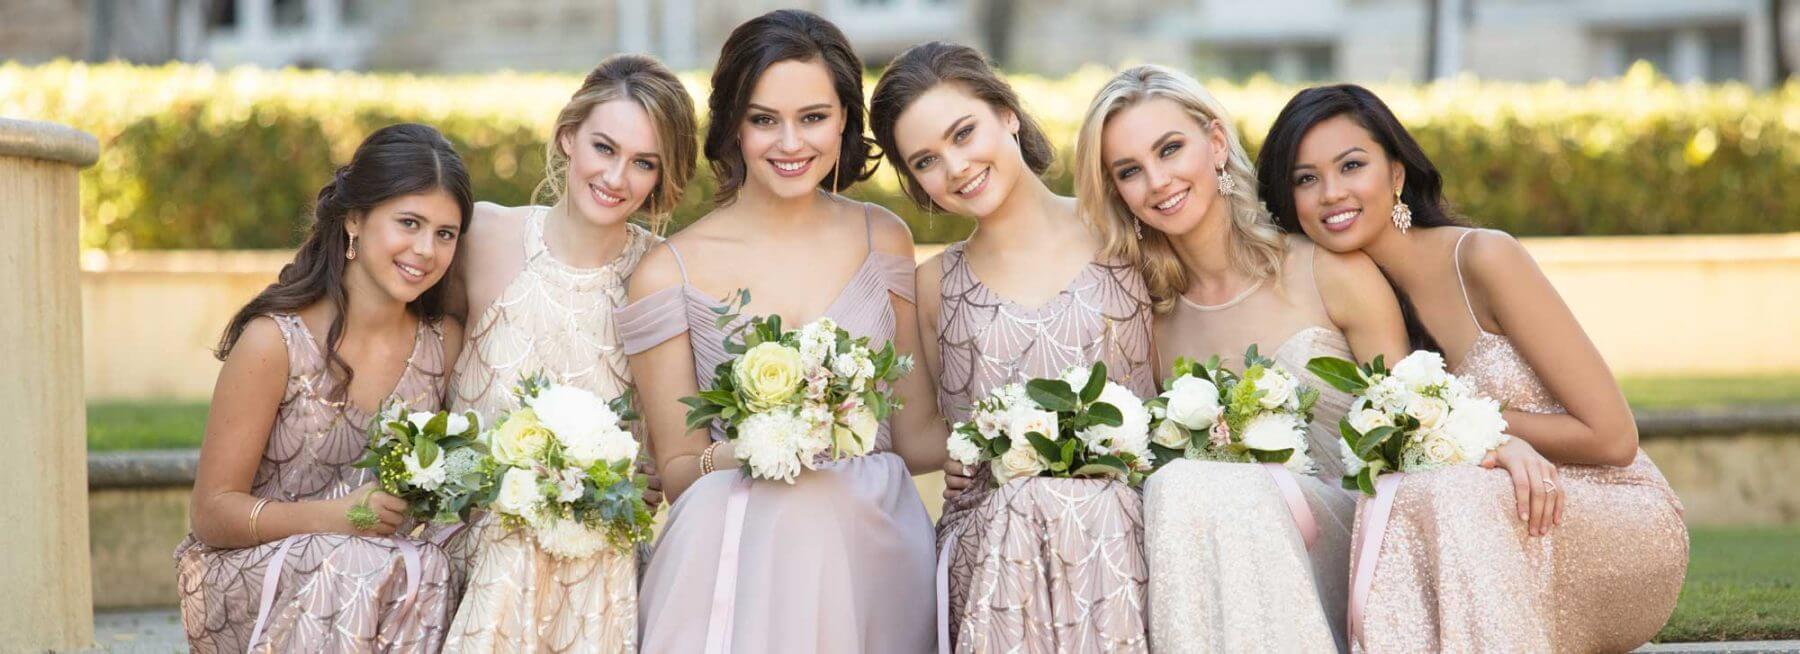 d6379a0239 Bridesmaid Dresses in Kansas City